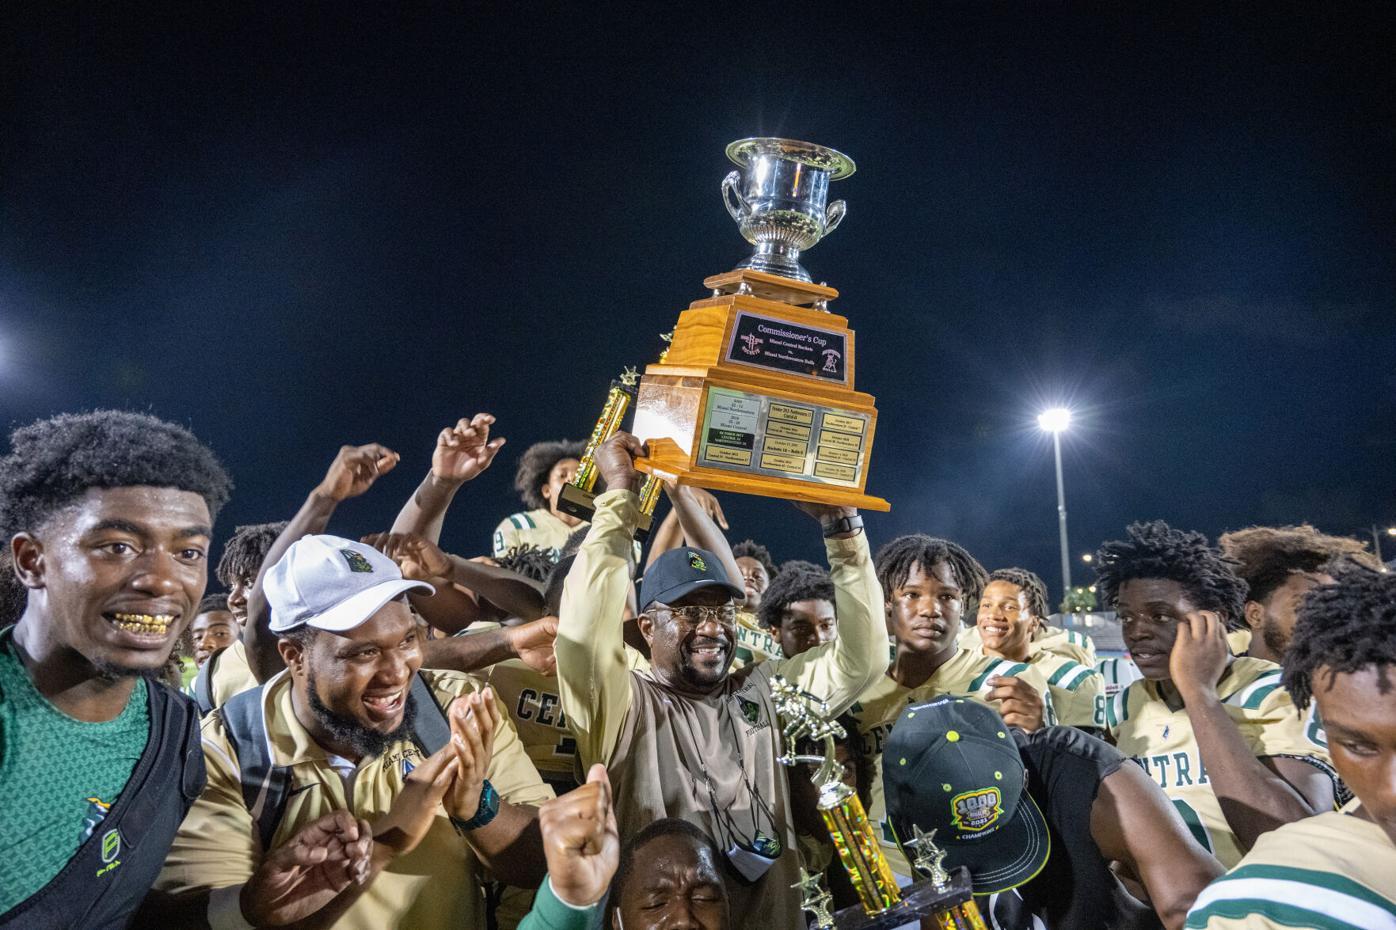 raises the Commissioner Cup trophy